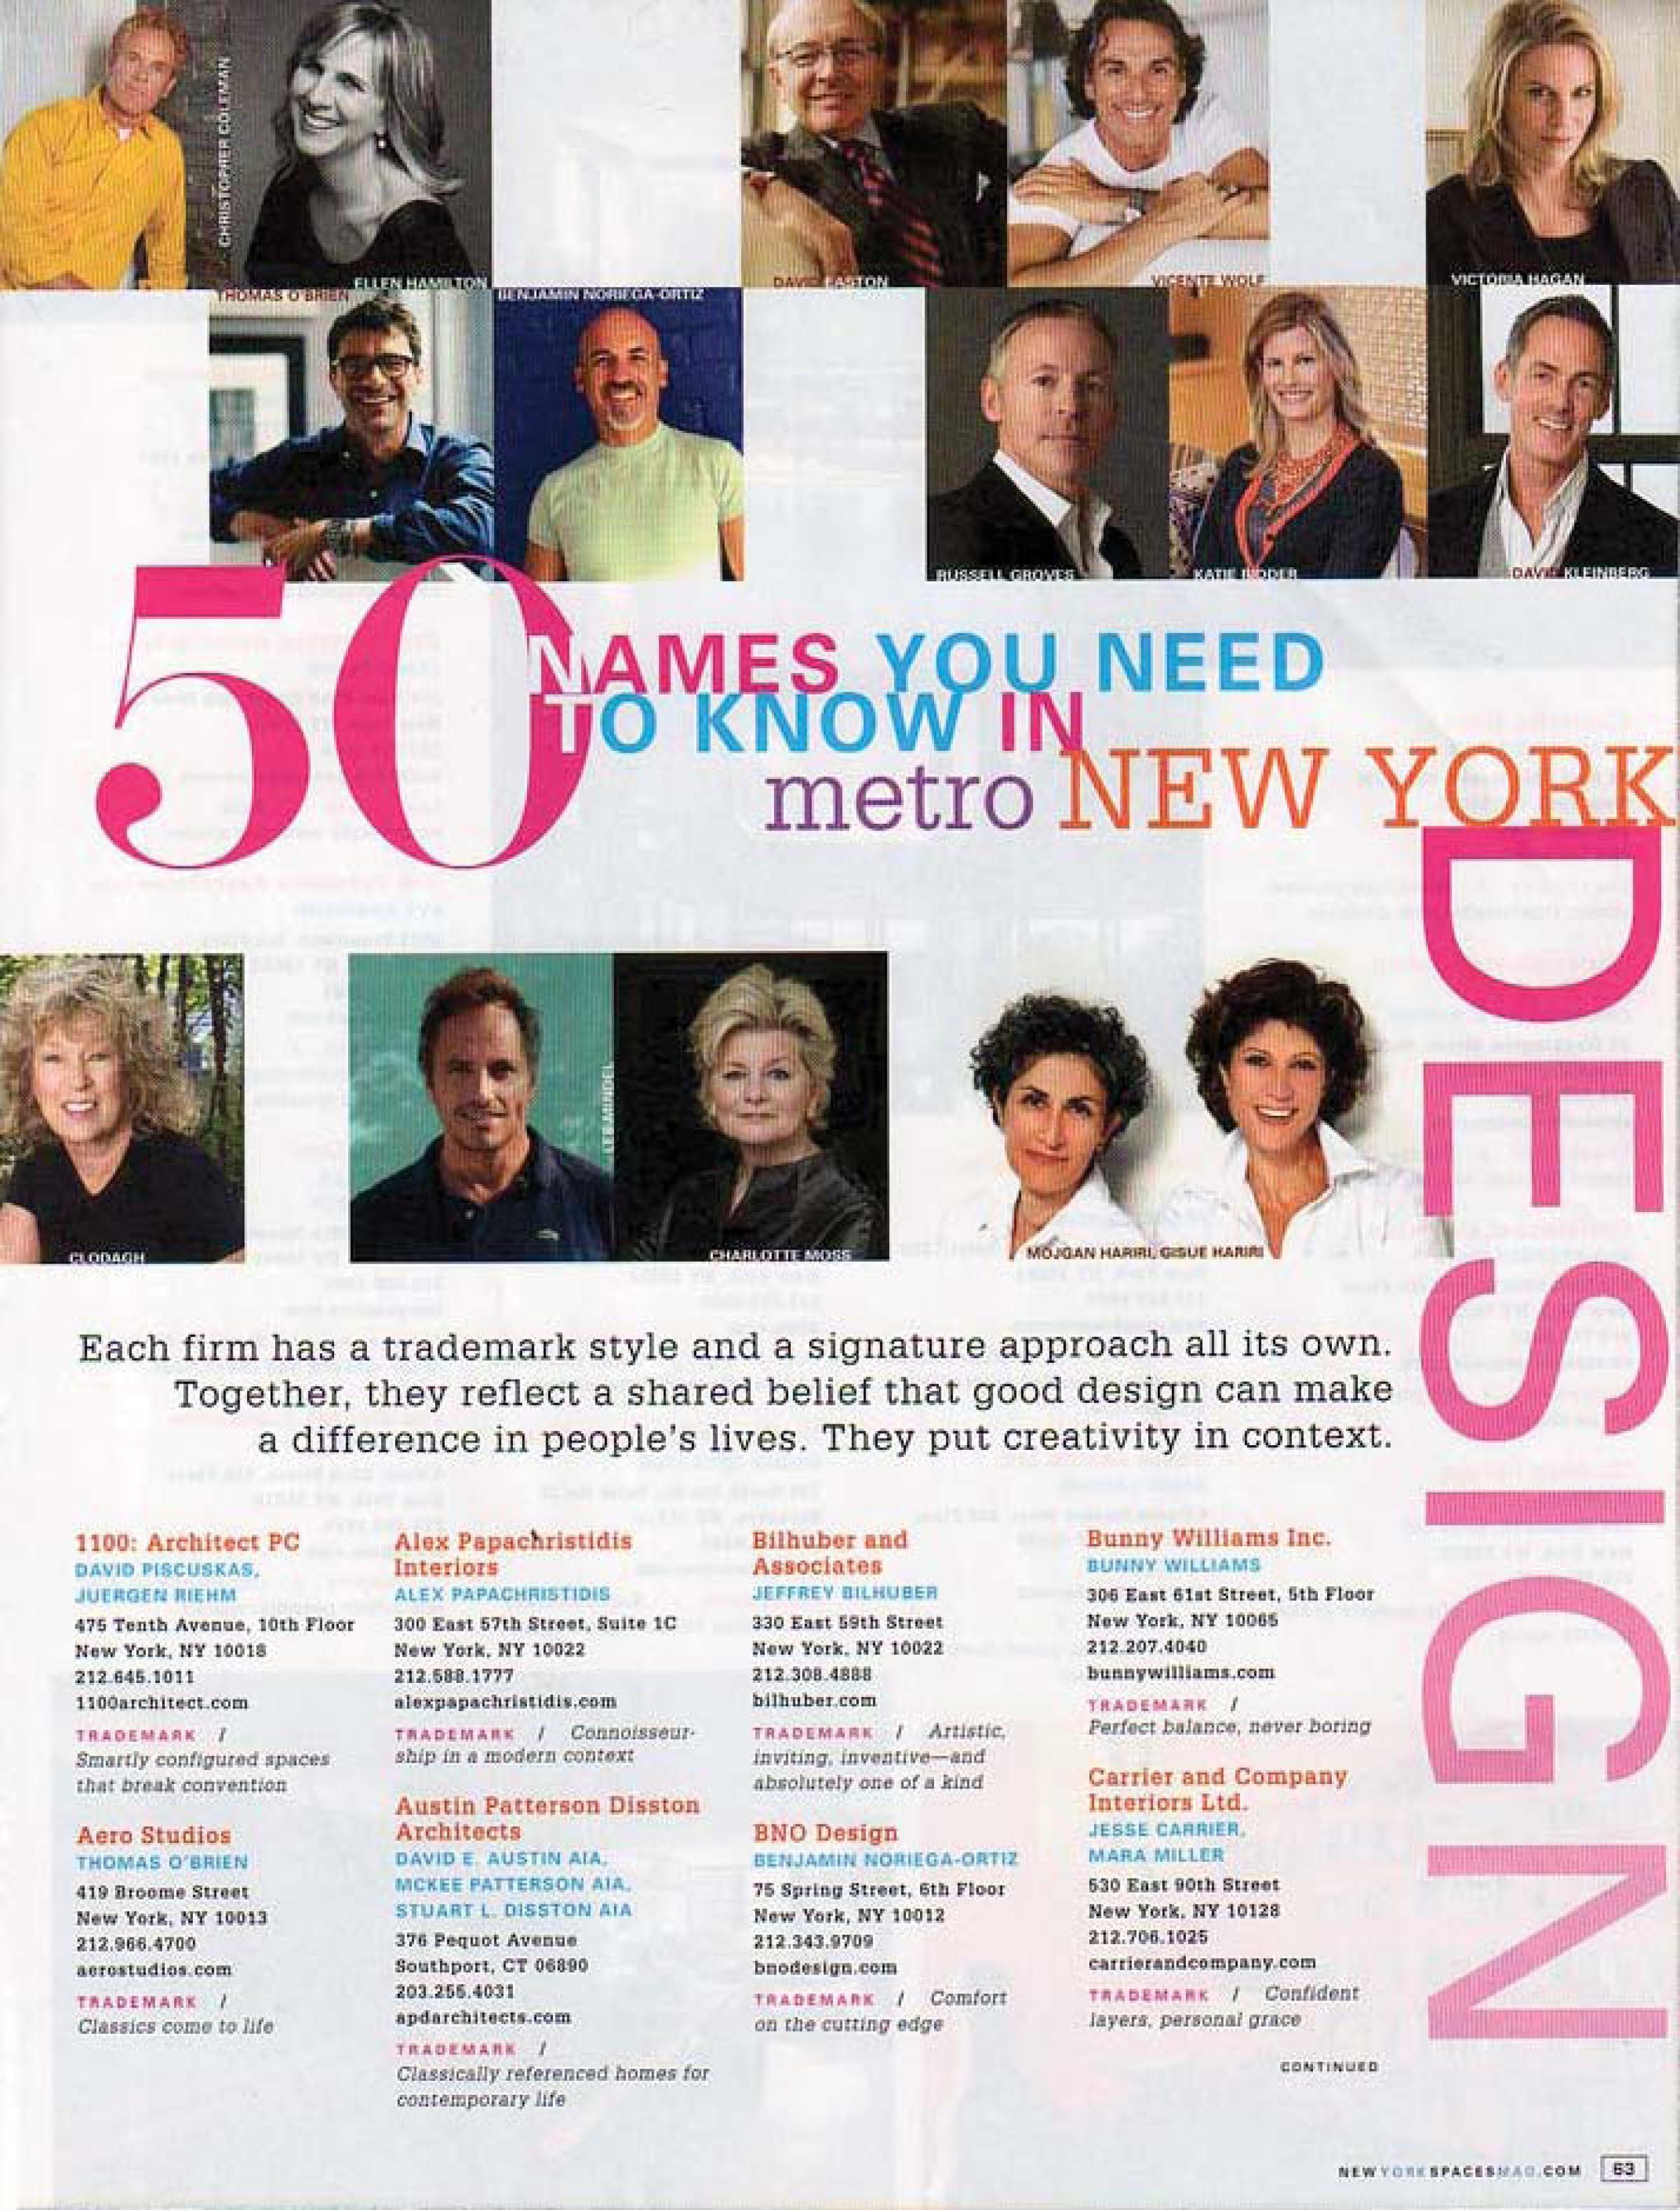 New_York_Spaces_2010_Top_50_Designers 2.jpg